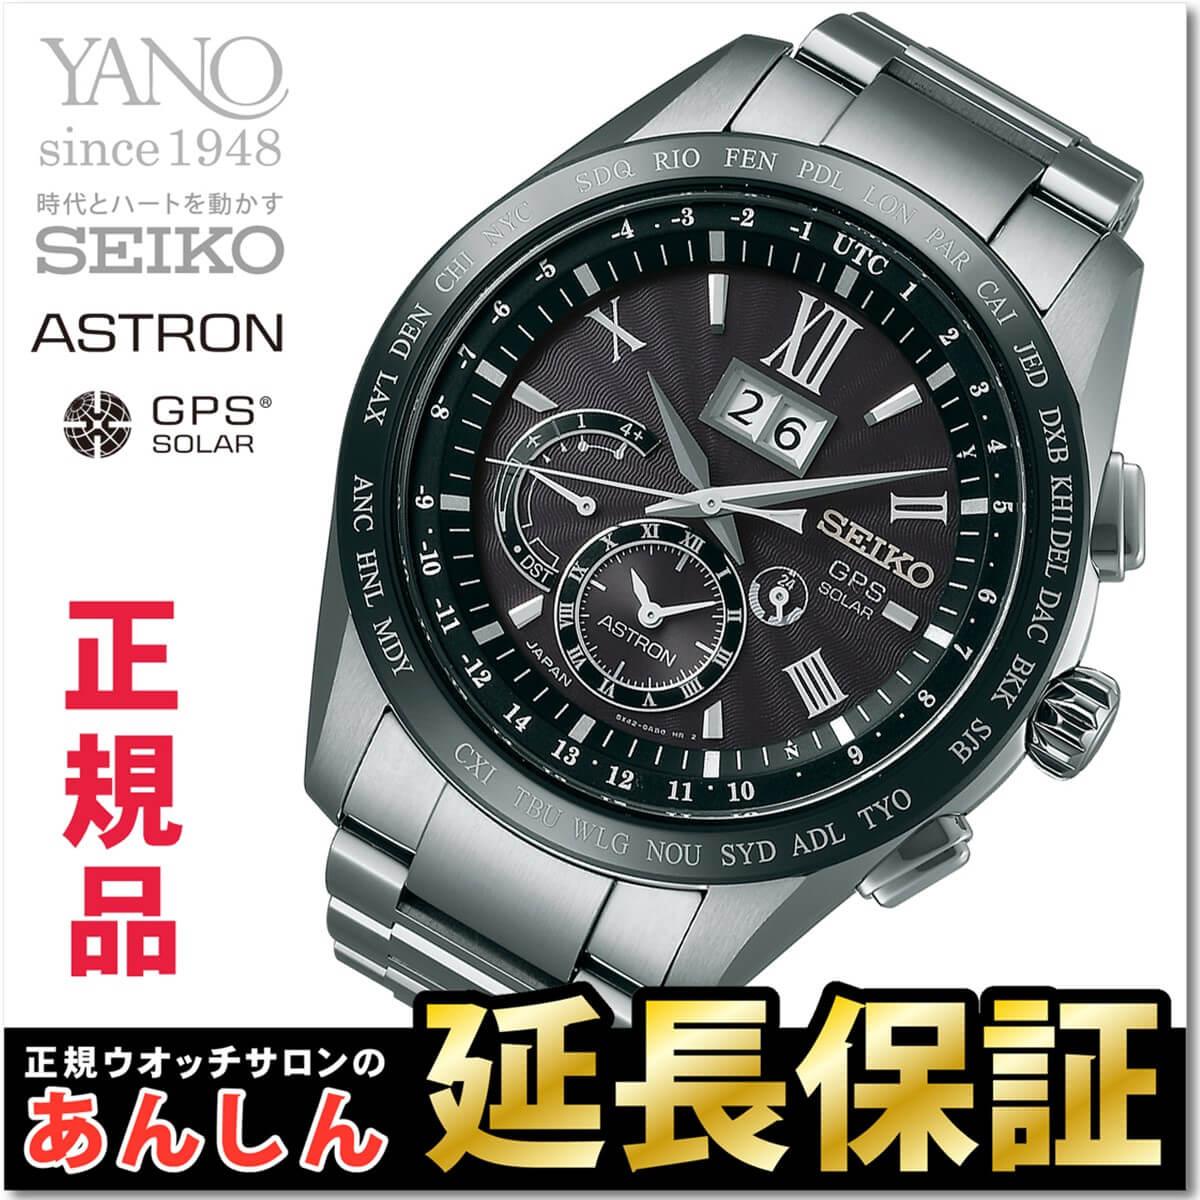 fc4bda9cf8 矢野時計店 本店に大阪市内有数のウオッチサロンがオープン致しました!お近くにお越しの際は是非お立ち寄り下さい!